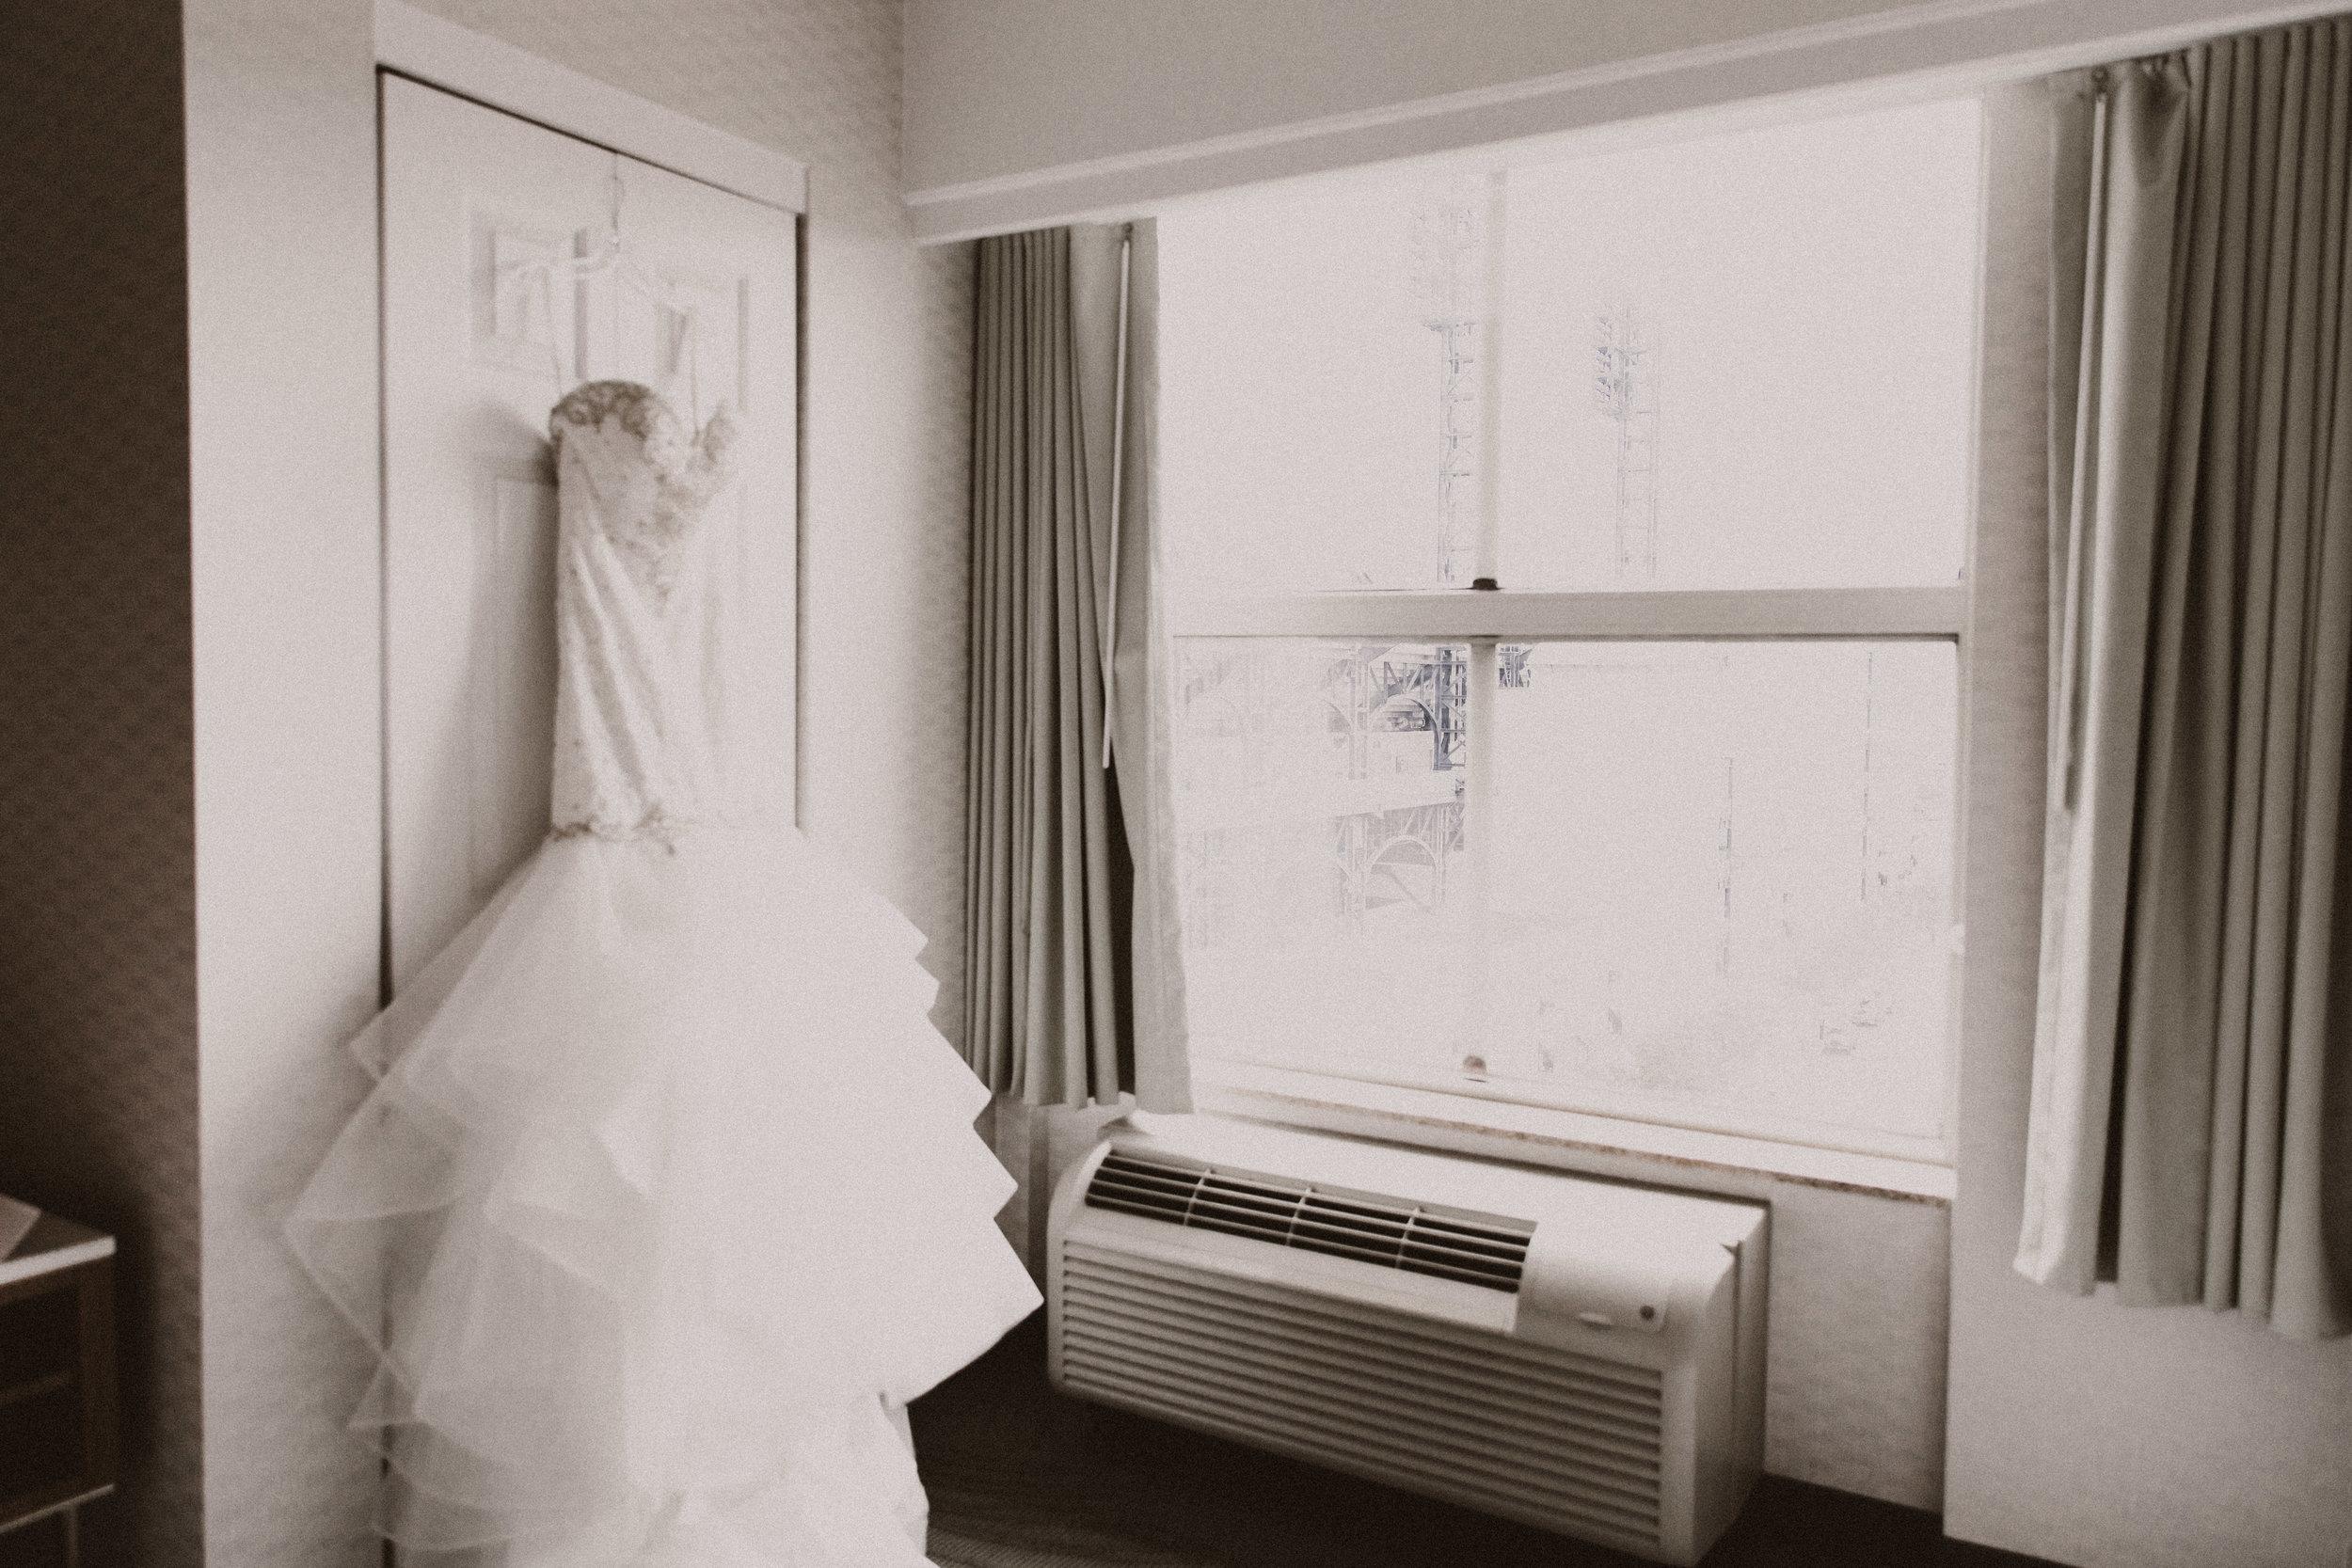 BUTLER, PA WEDDING PHOTOGRAPHER - 5W7A2969.jpg